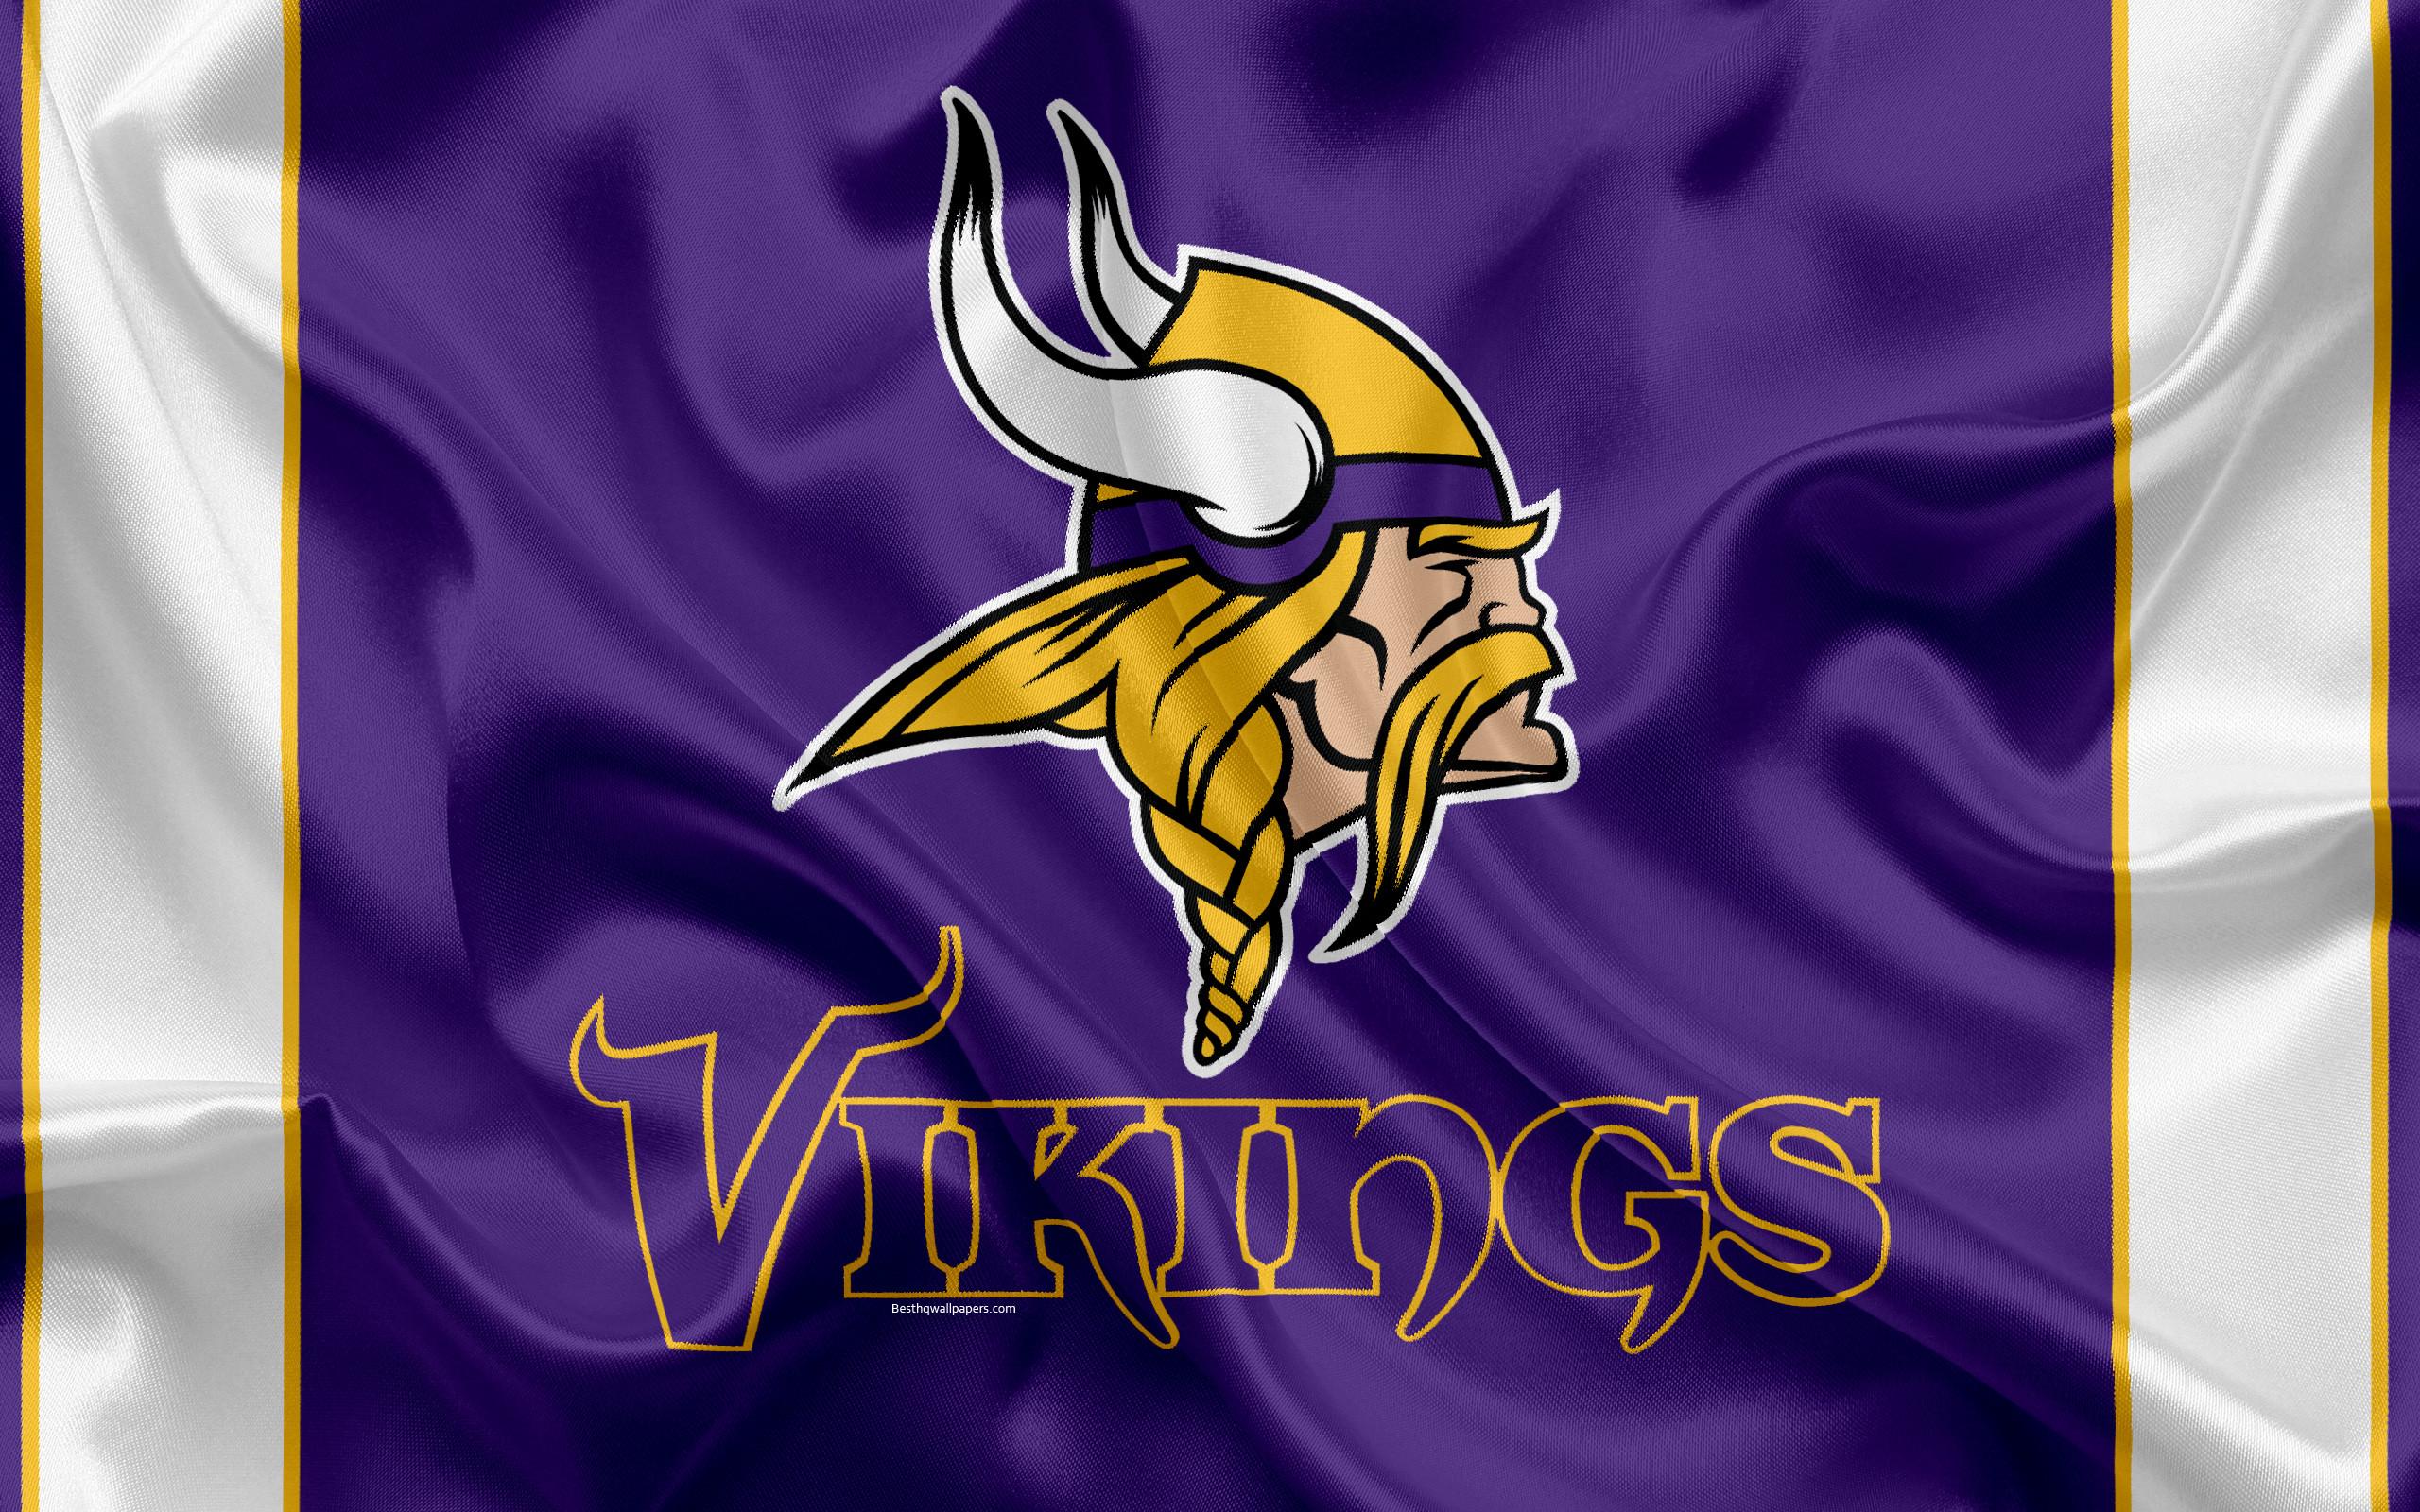 Res: 2560x1600, Minnesota Vikings, American football, logo, emblem, NFL, National Football  League,